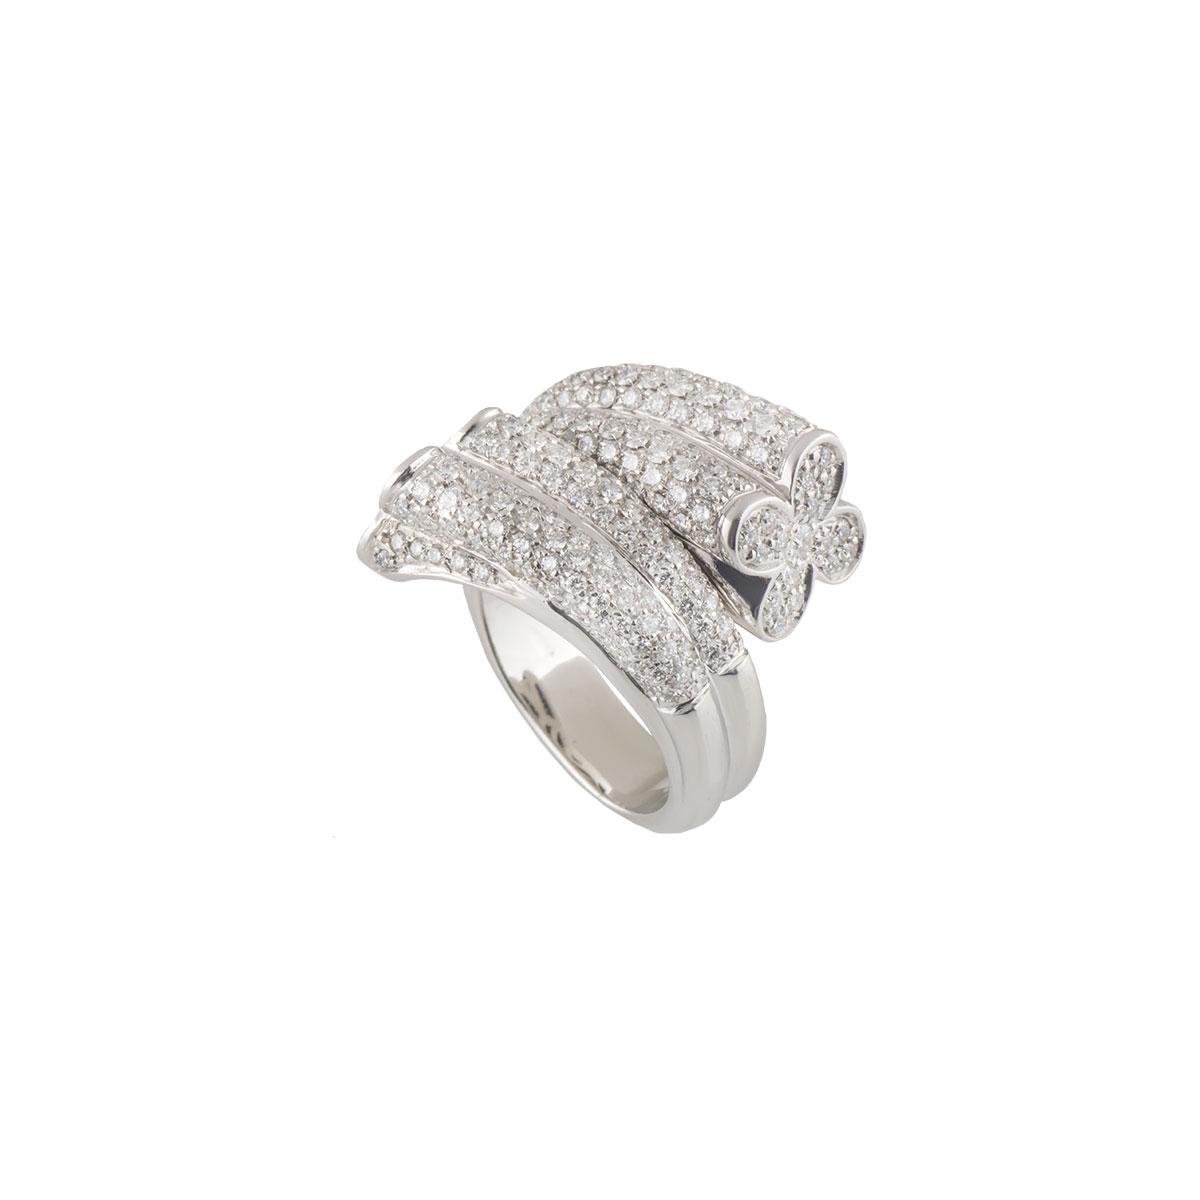 White Gold Diamond Ring 2.44ct G/VS